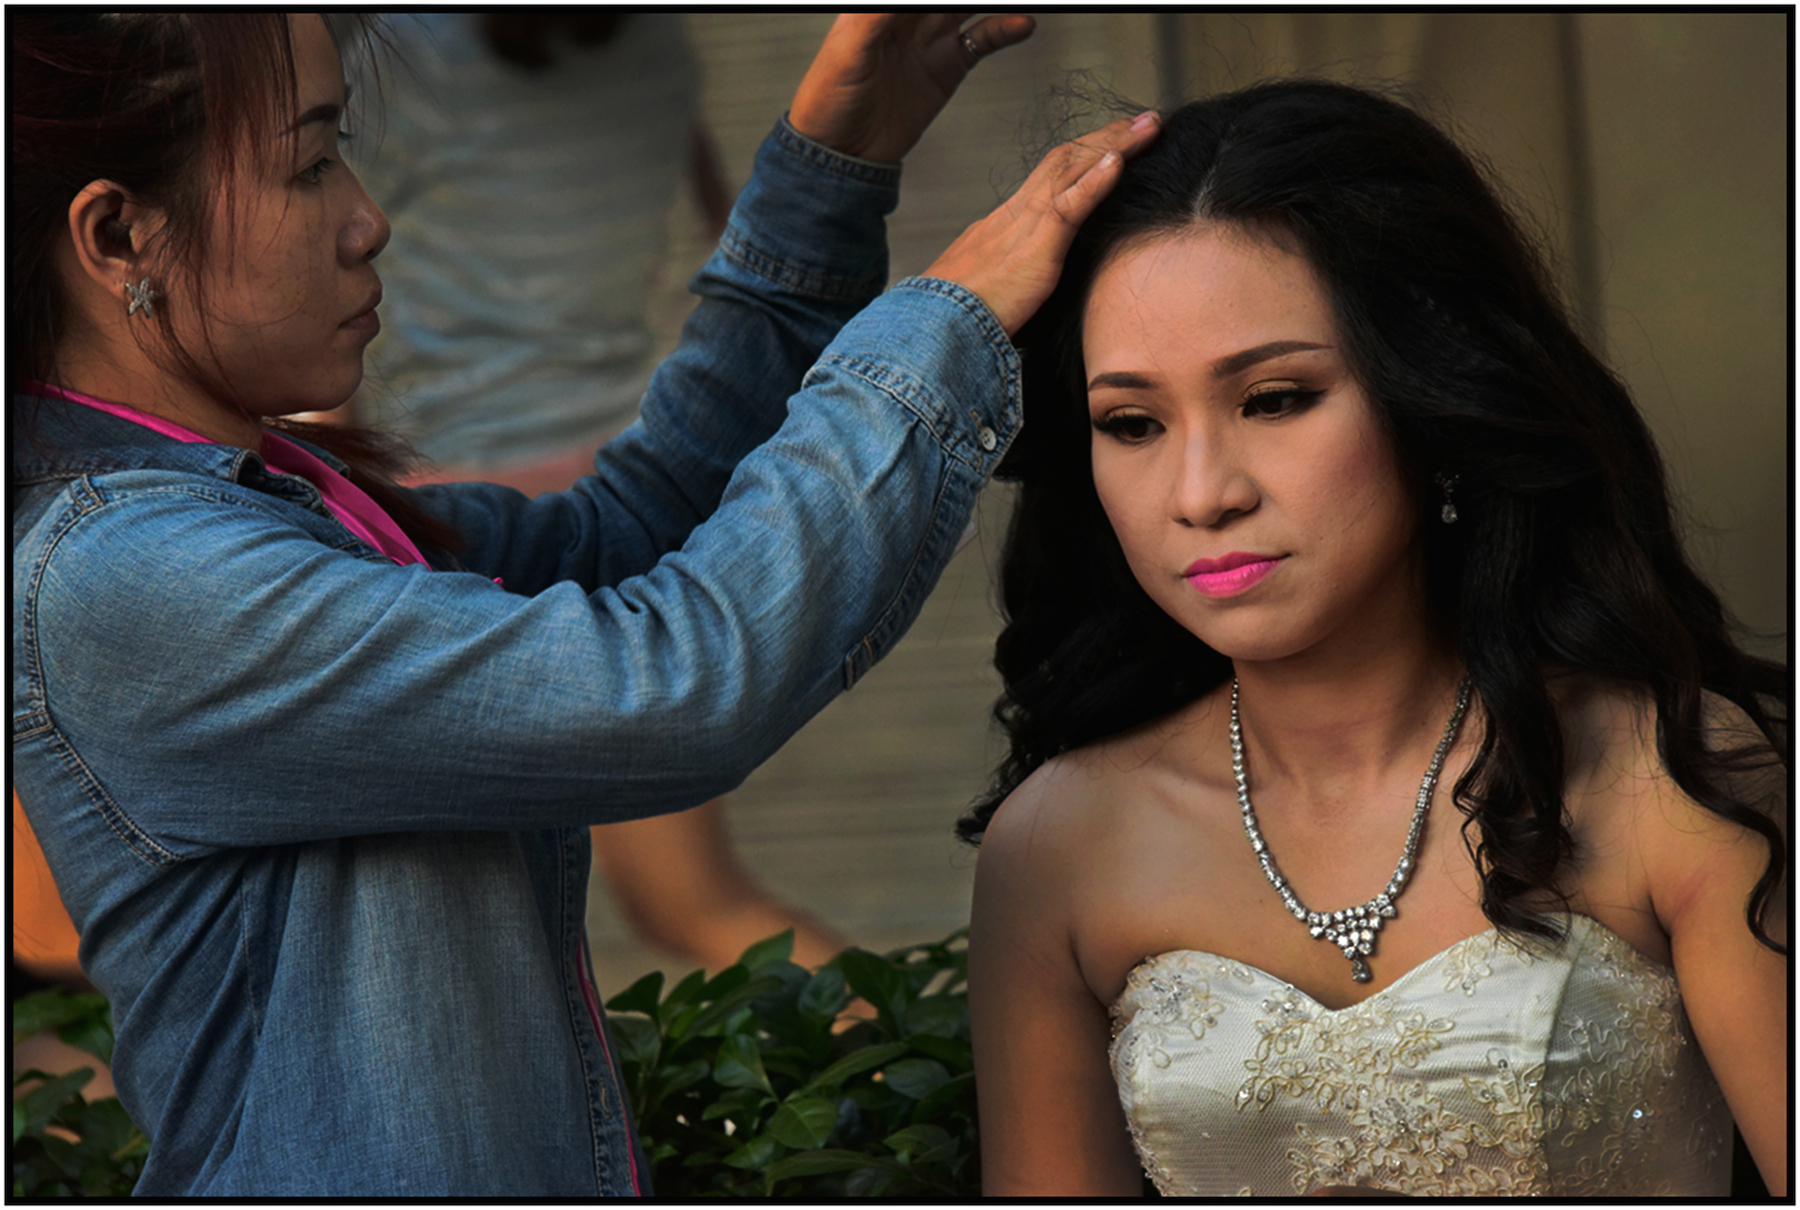 Preparation for wedding photography, Saigon/HCMC, Dec. 2015. #5259